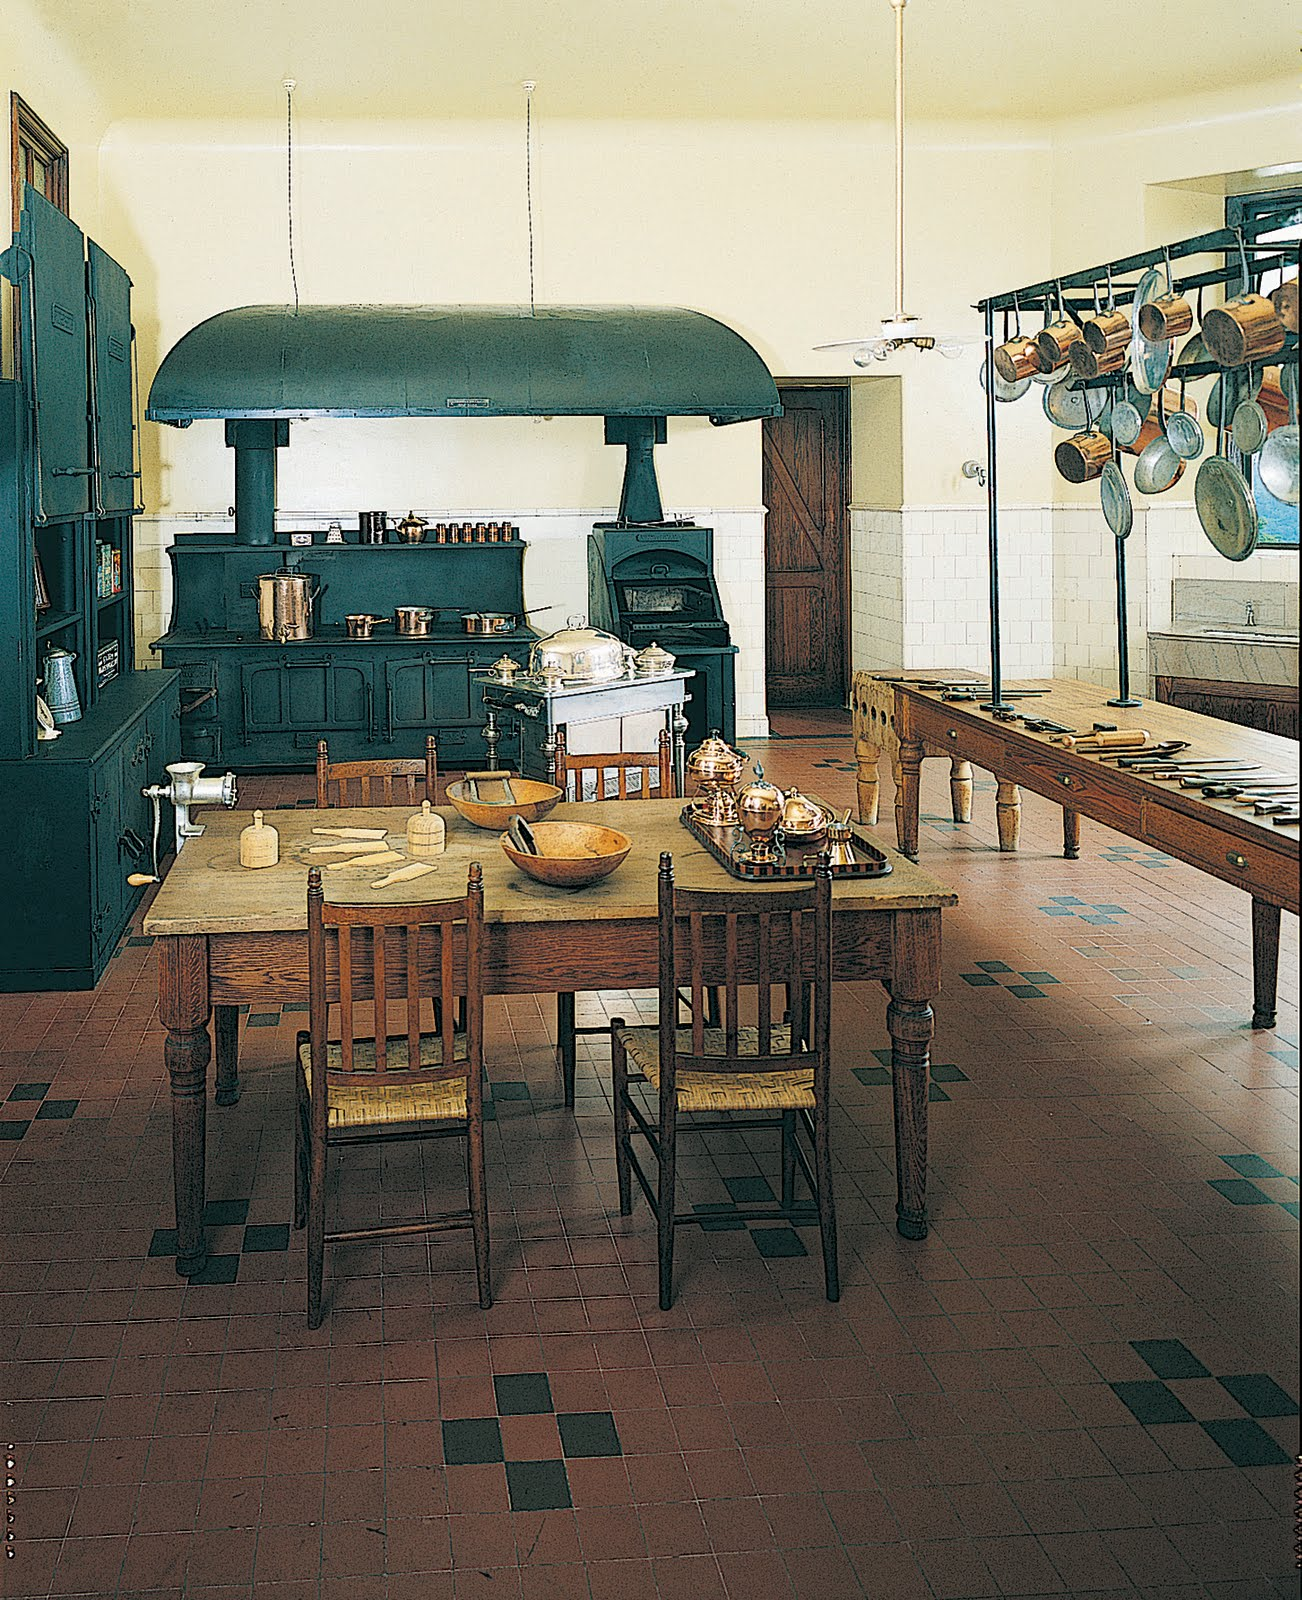 Mansion Kitchen Pictures: 1000+ Images About The Vanderbilts On Pinterest